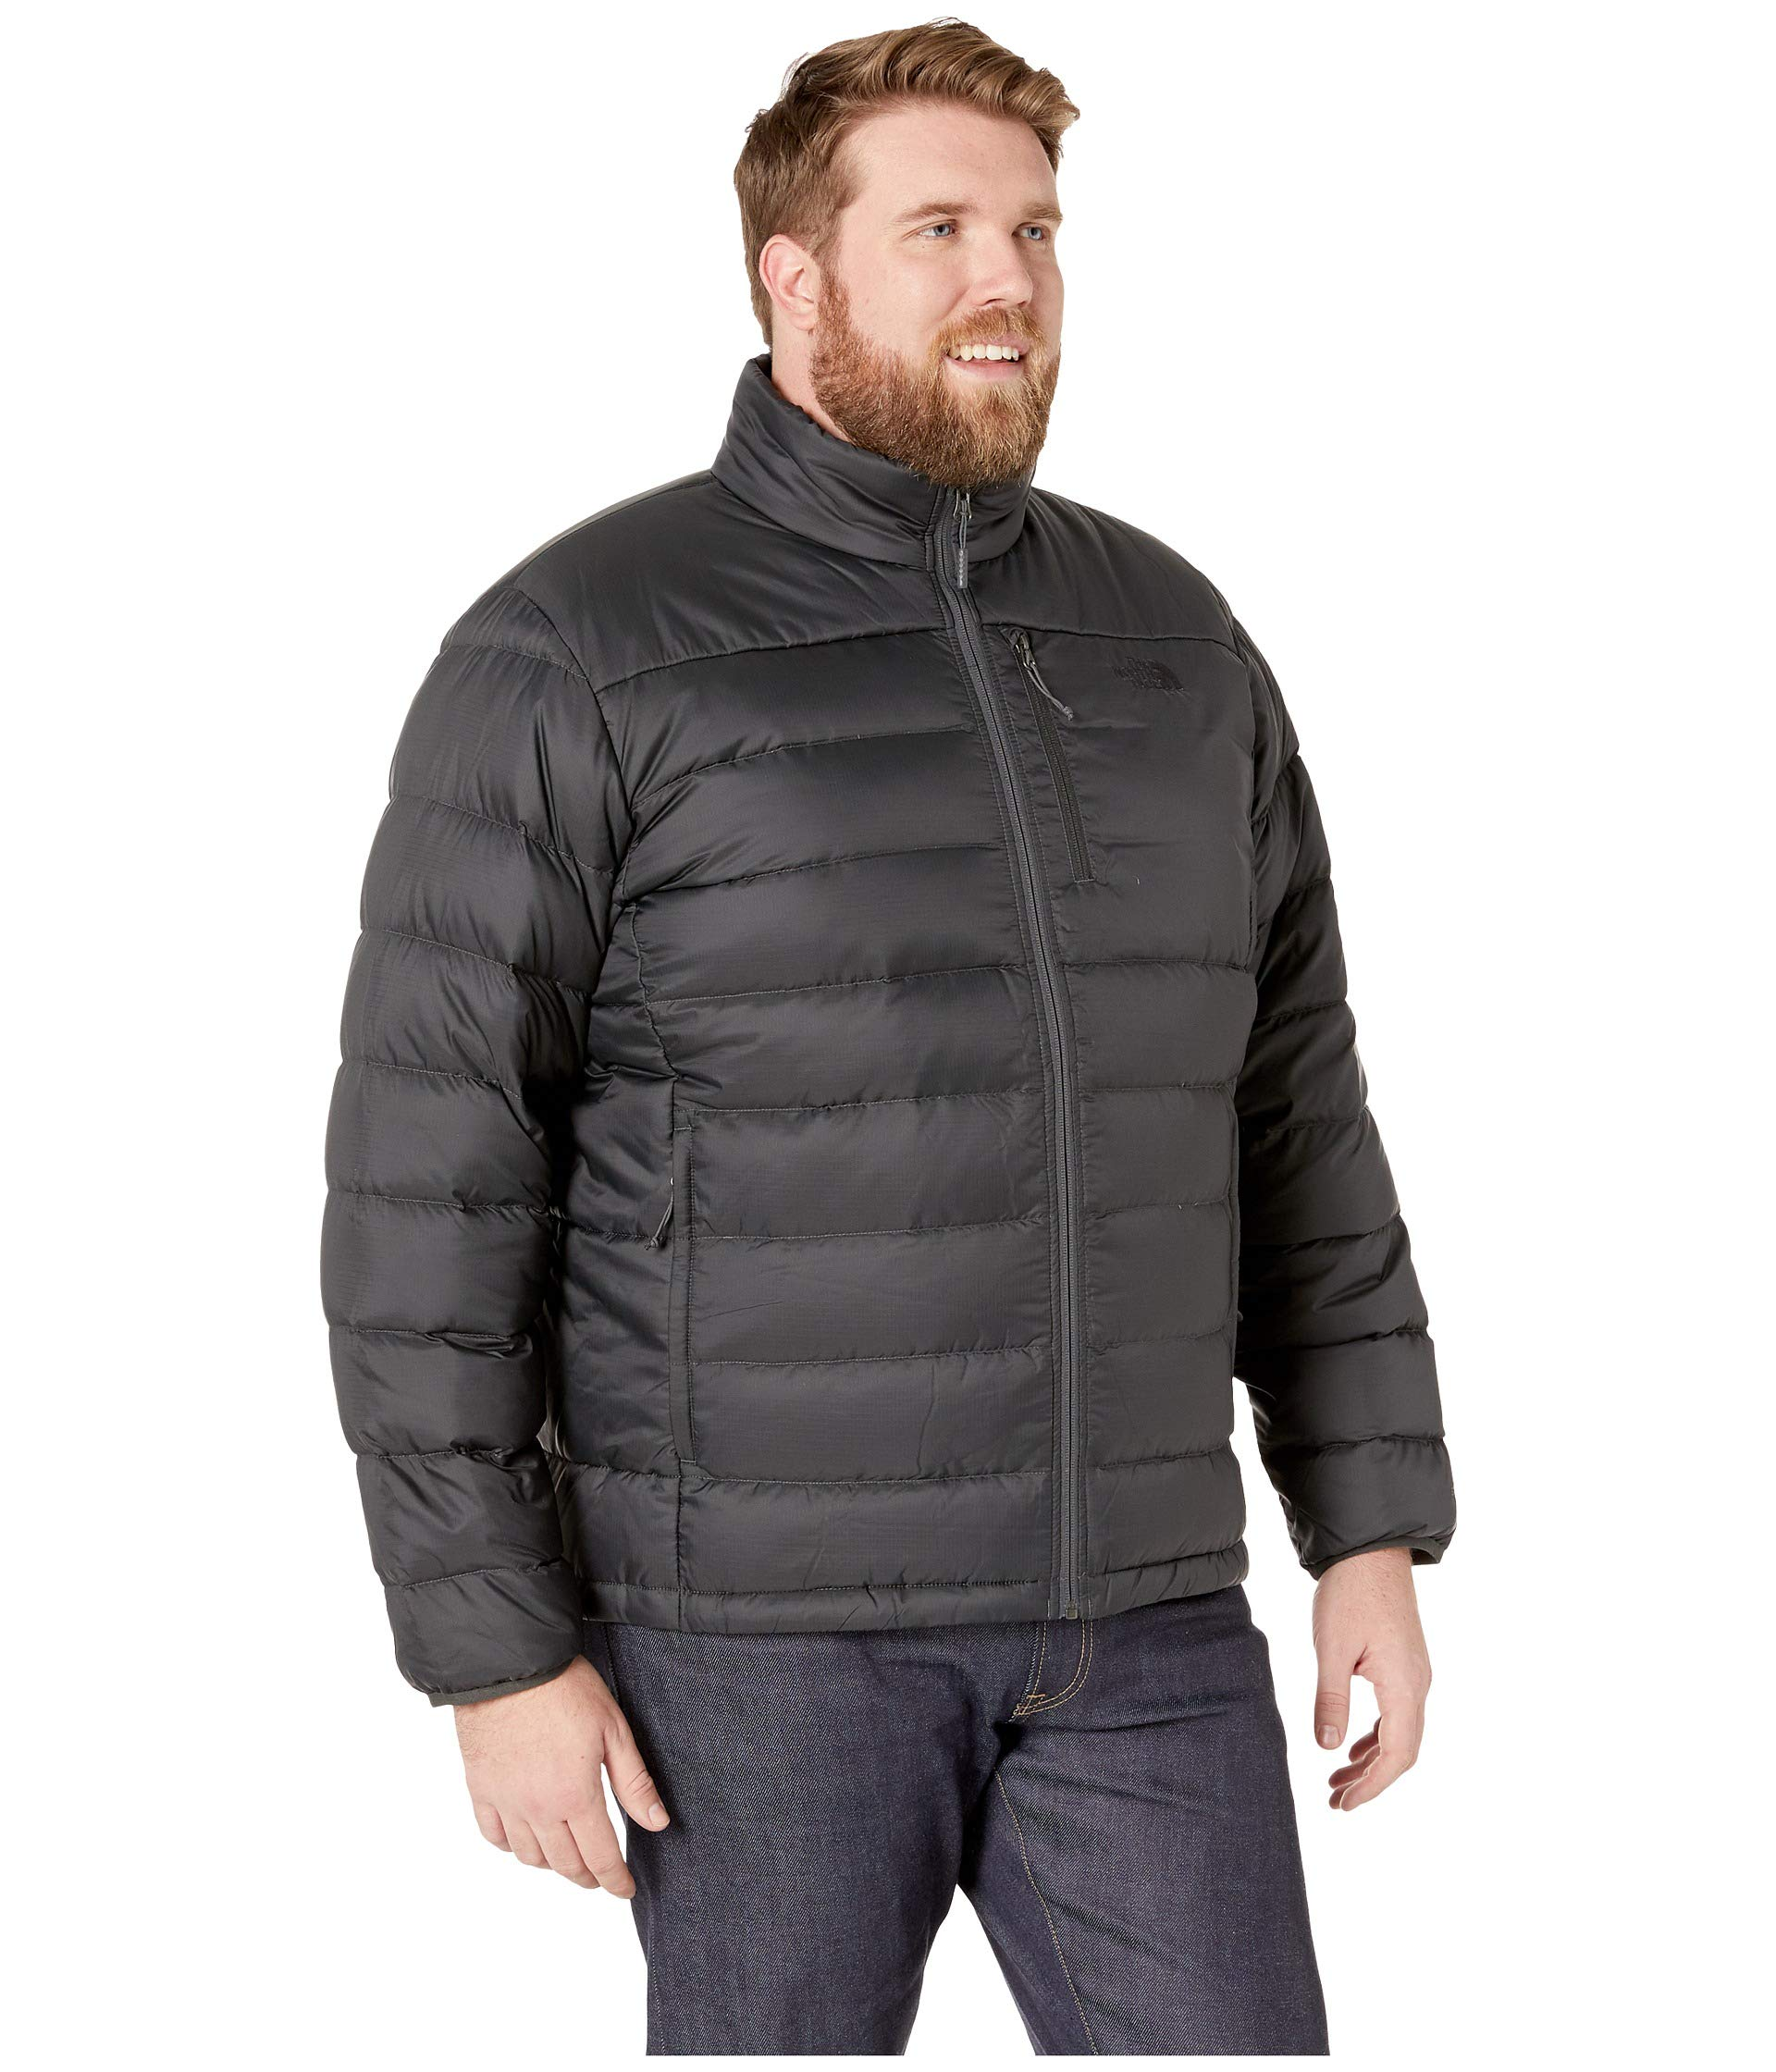 Grey Aconcagua Asphalt The North Face Jacket wxRwPfHSqv